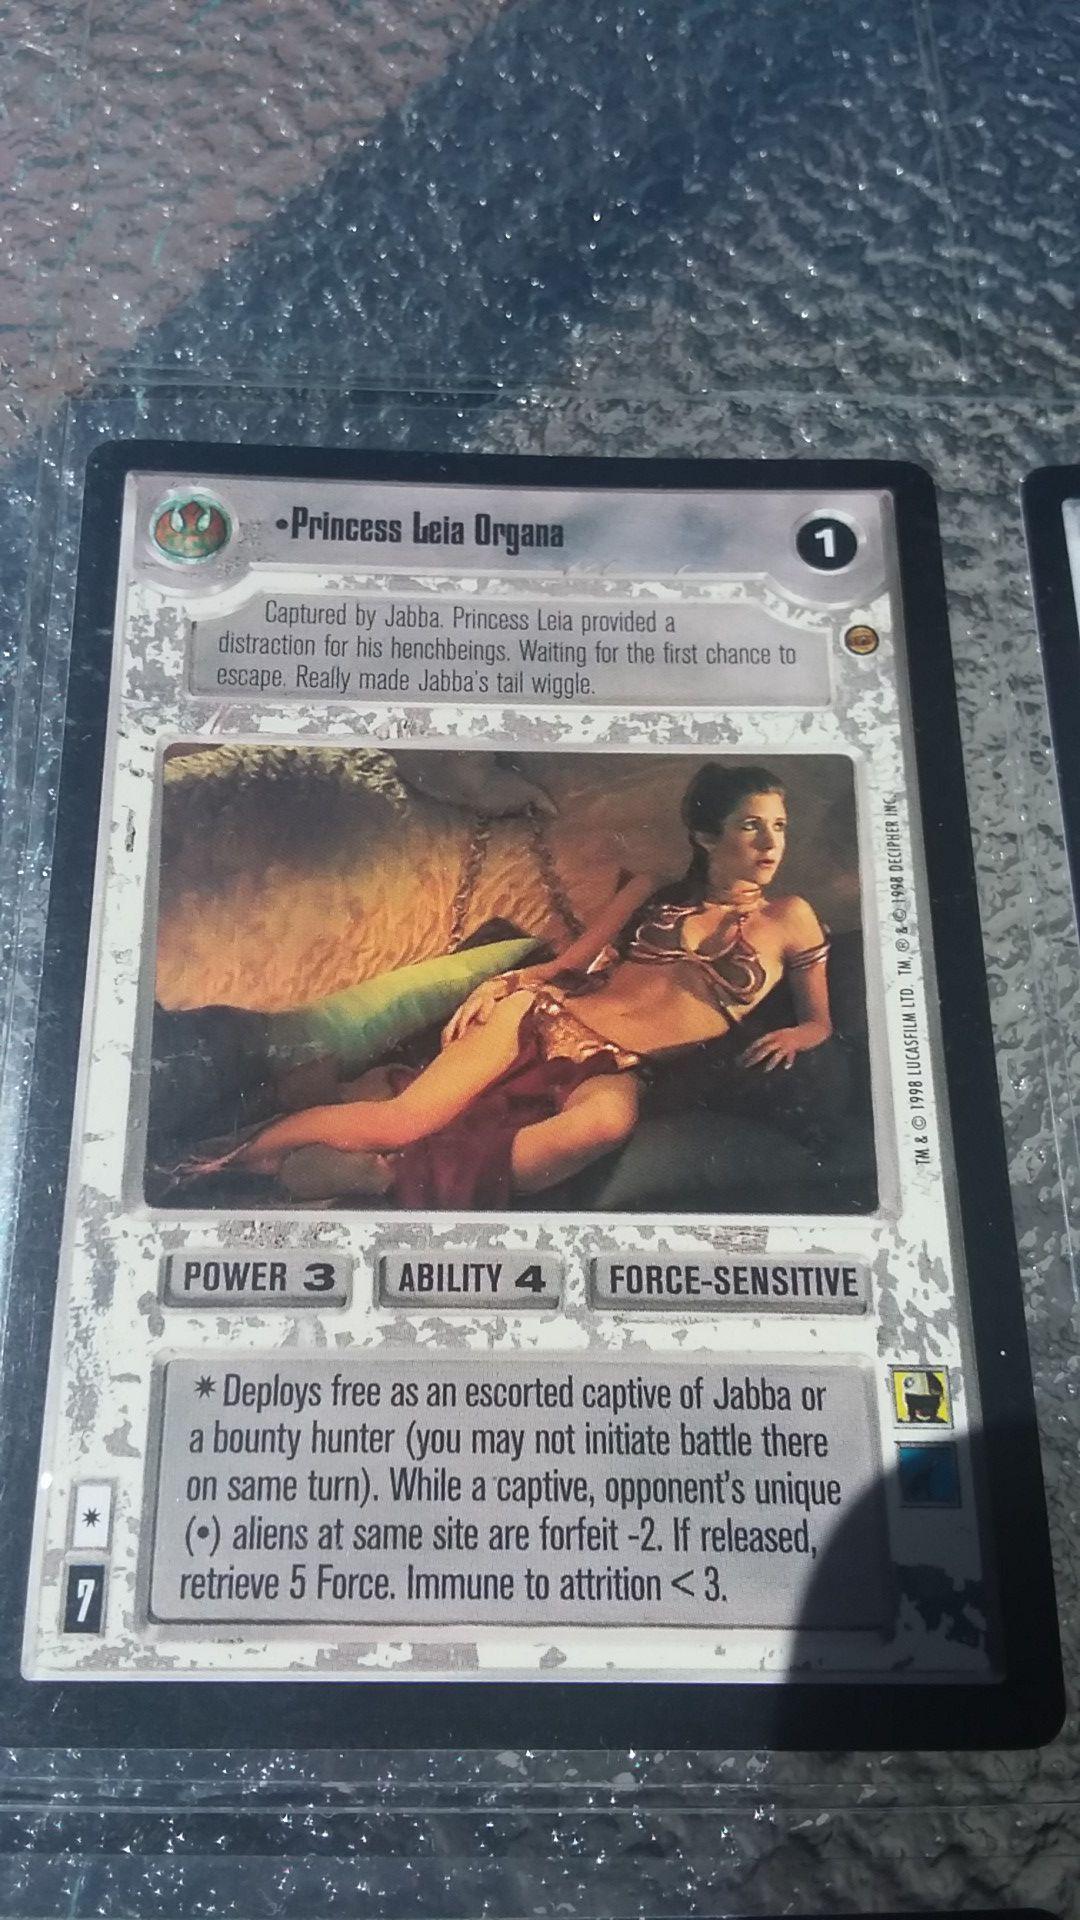 1997 star wars game trading card ccg Princess Leia